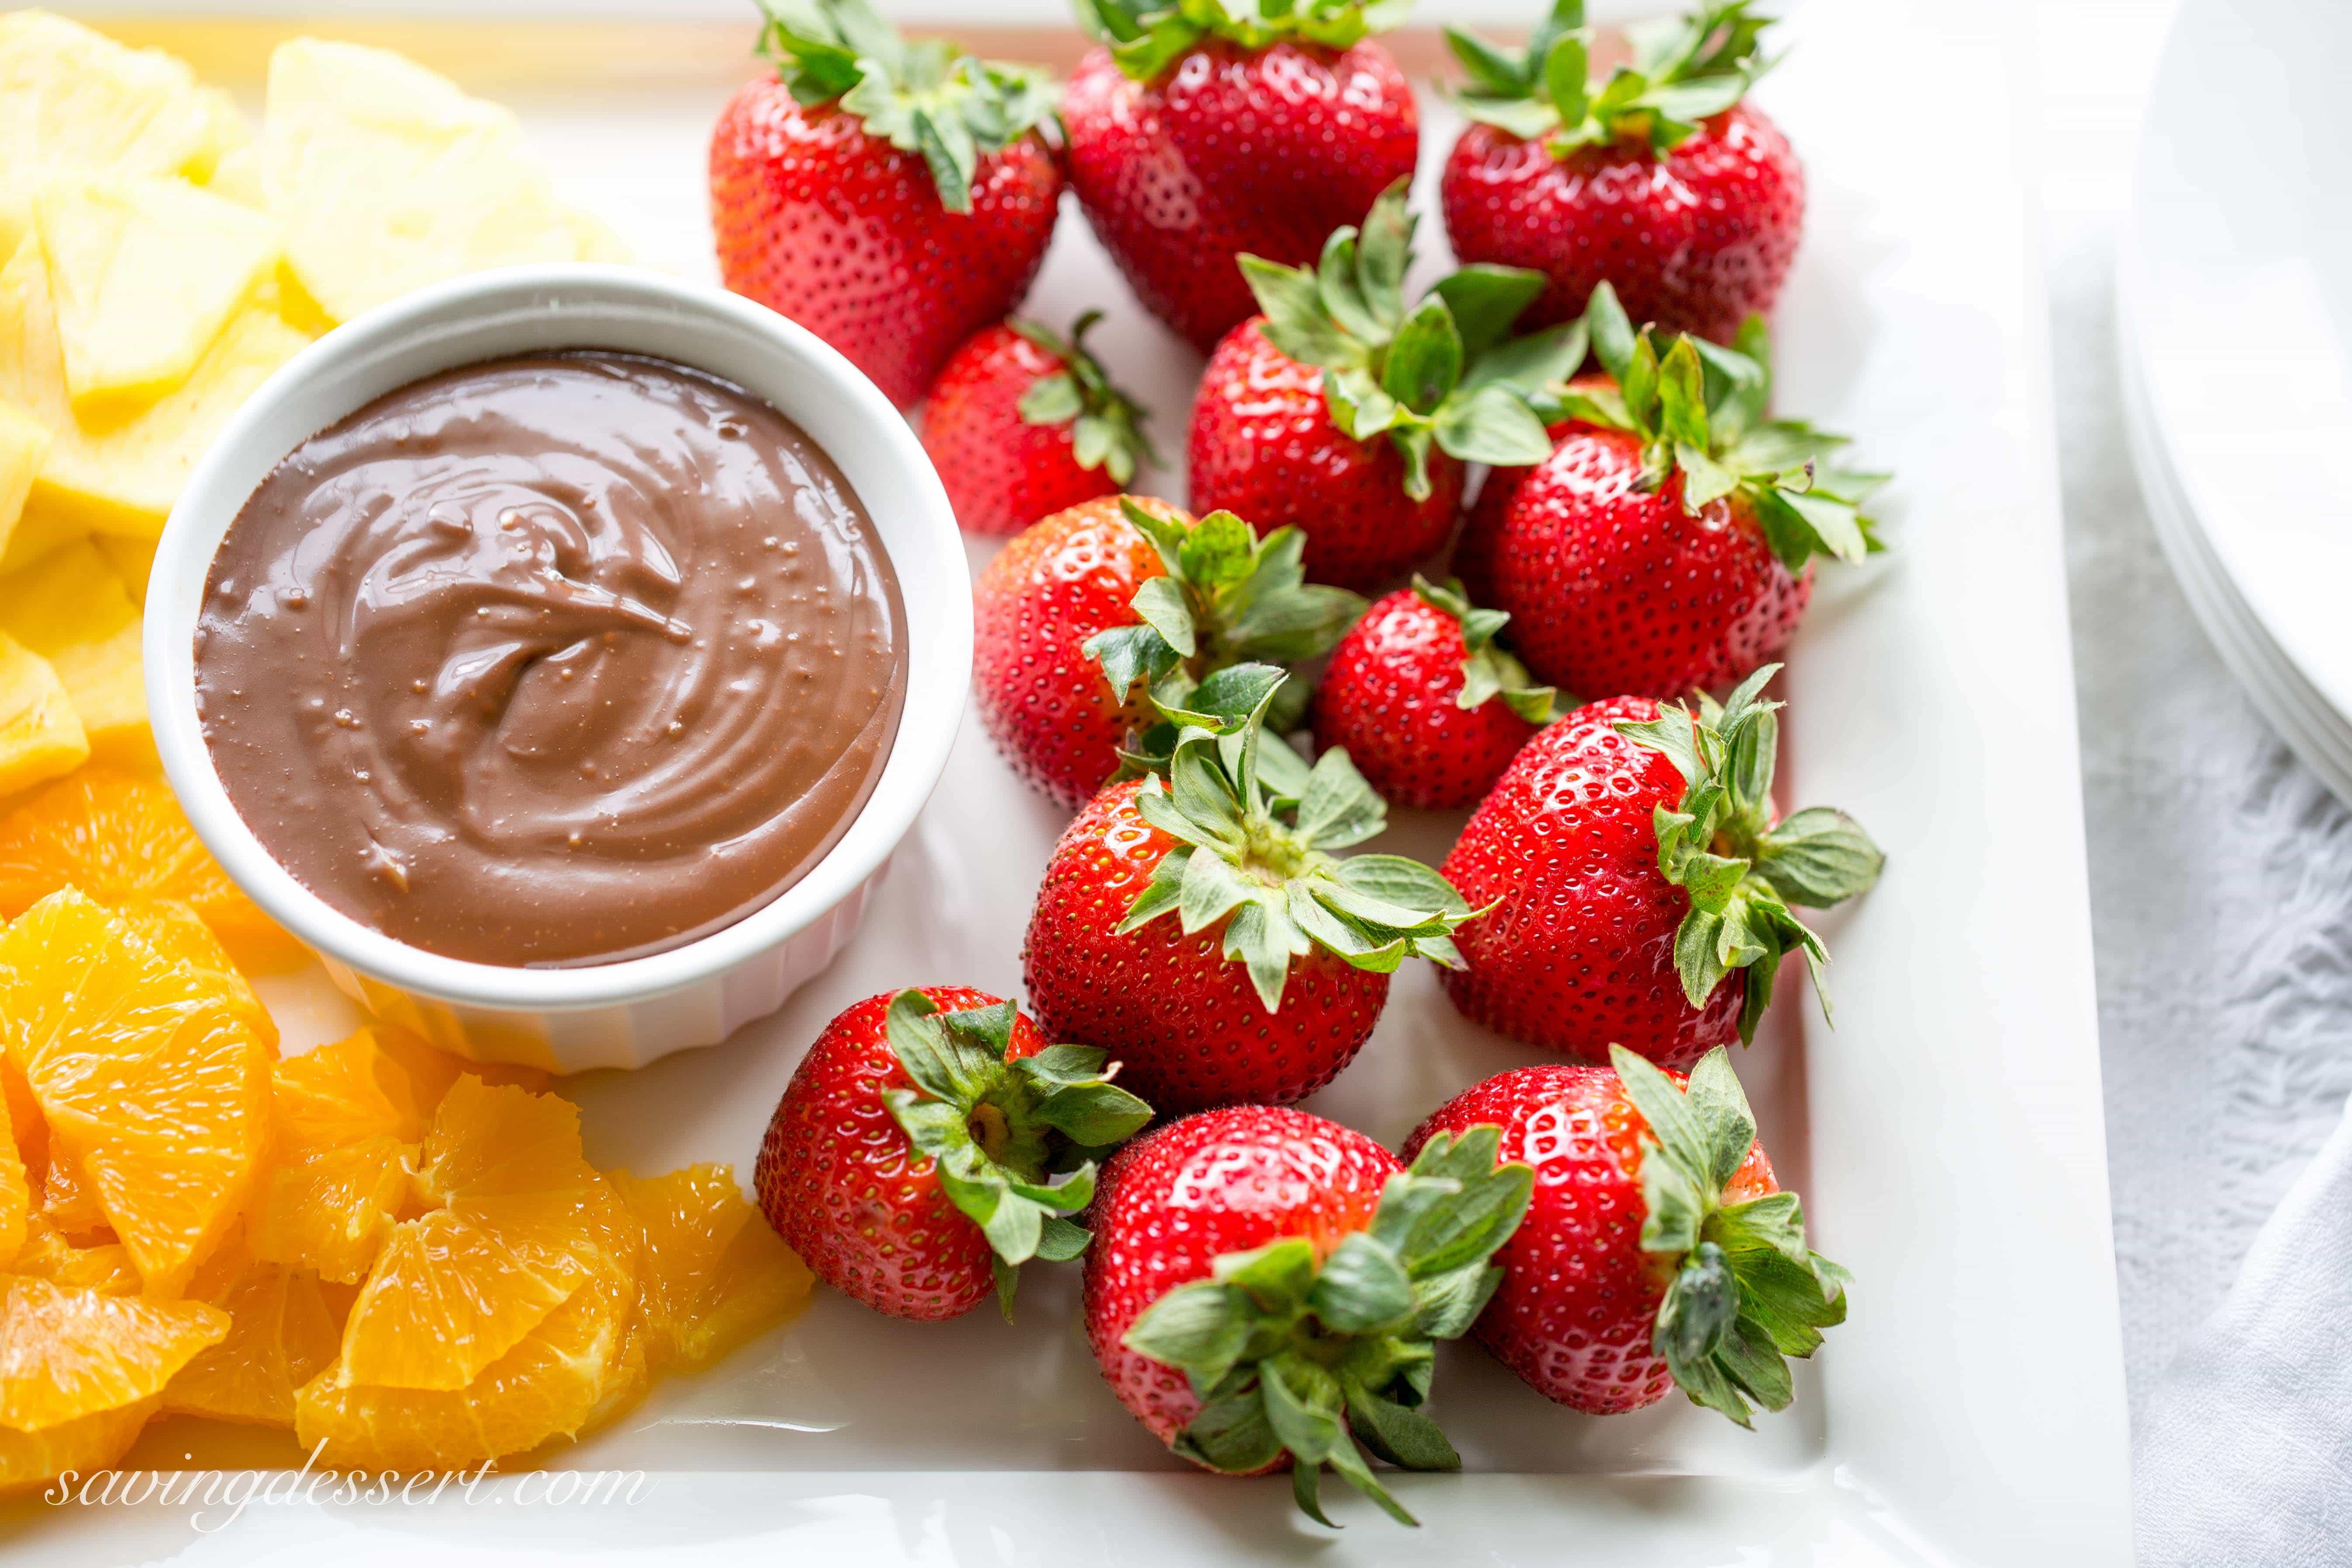 Chocolate Dulce de Leche Dip - Saving Room for Dessert